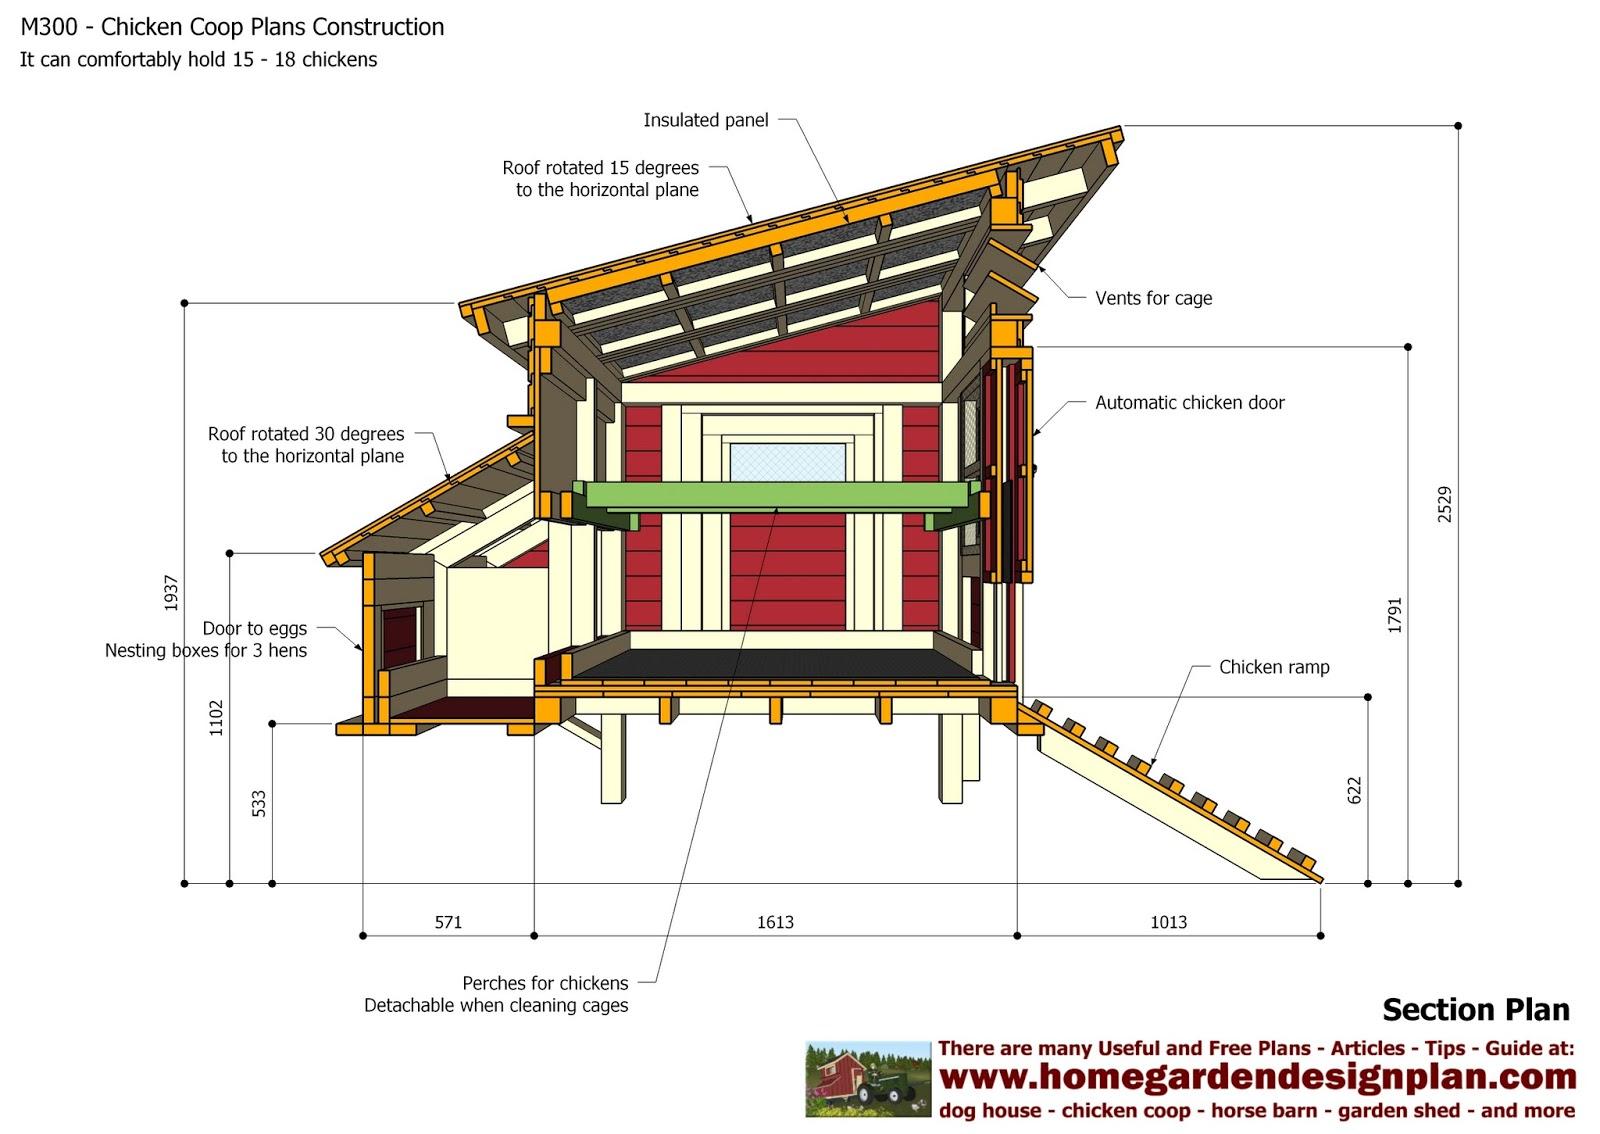 Home garden plans m300 chicken coop plans chicken for Coop house plans